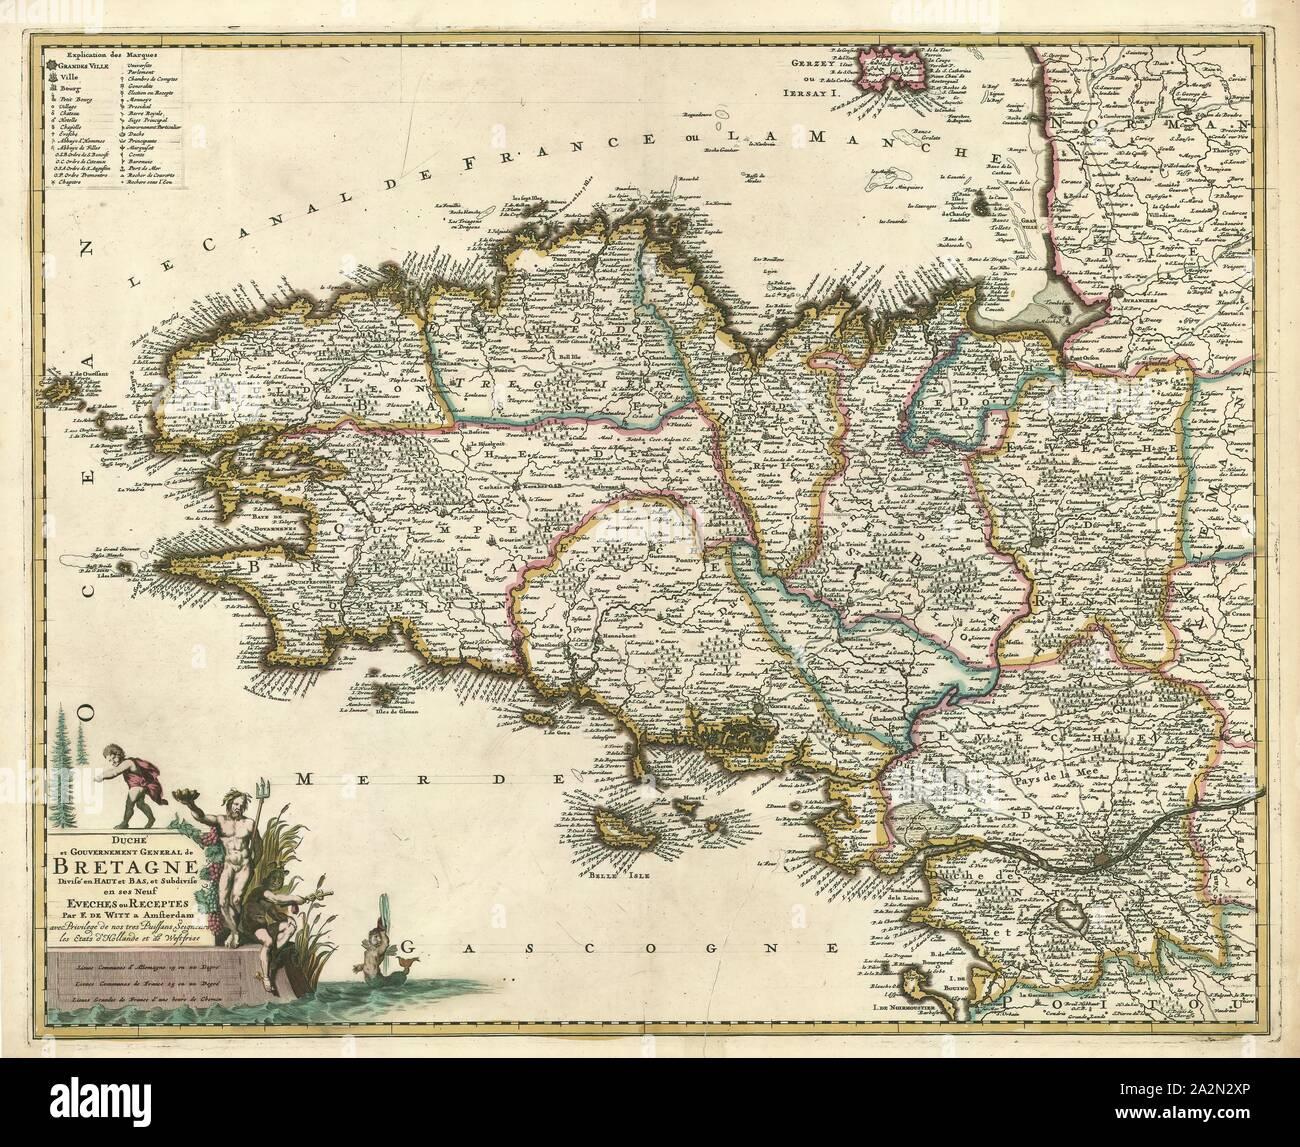 Bretagne Map Stock Photos Bretagne Map Stock Images Alamy